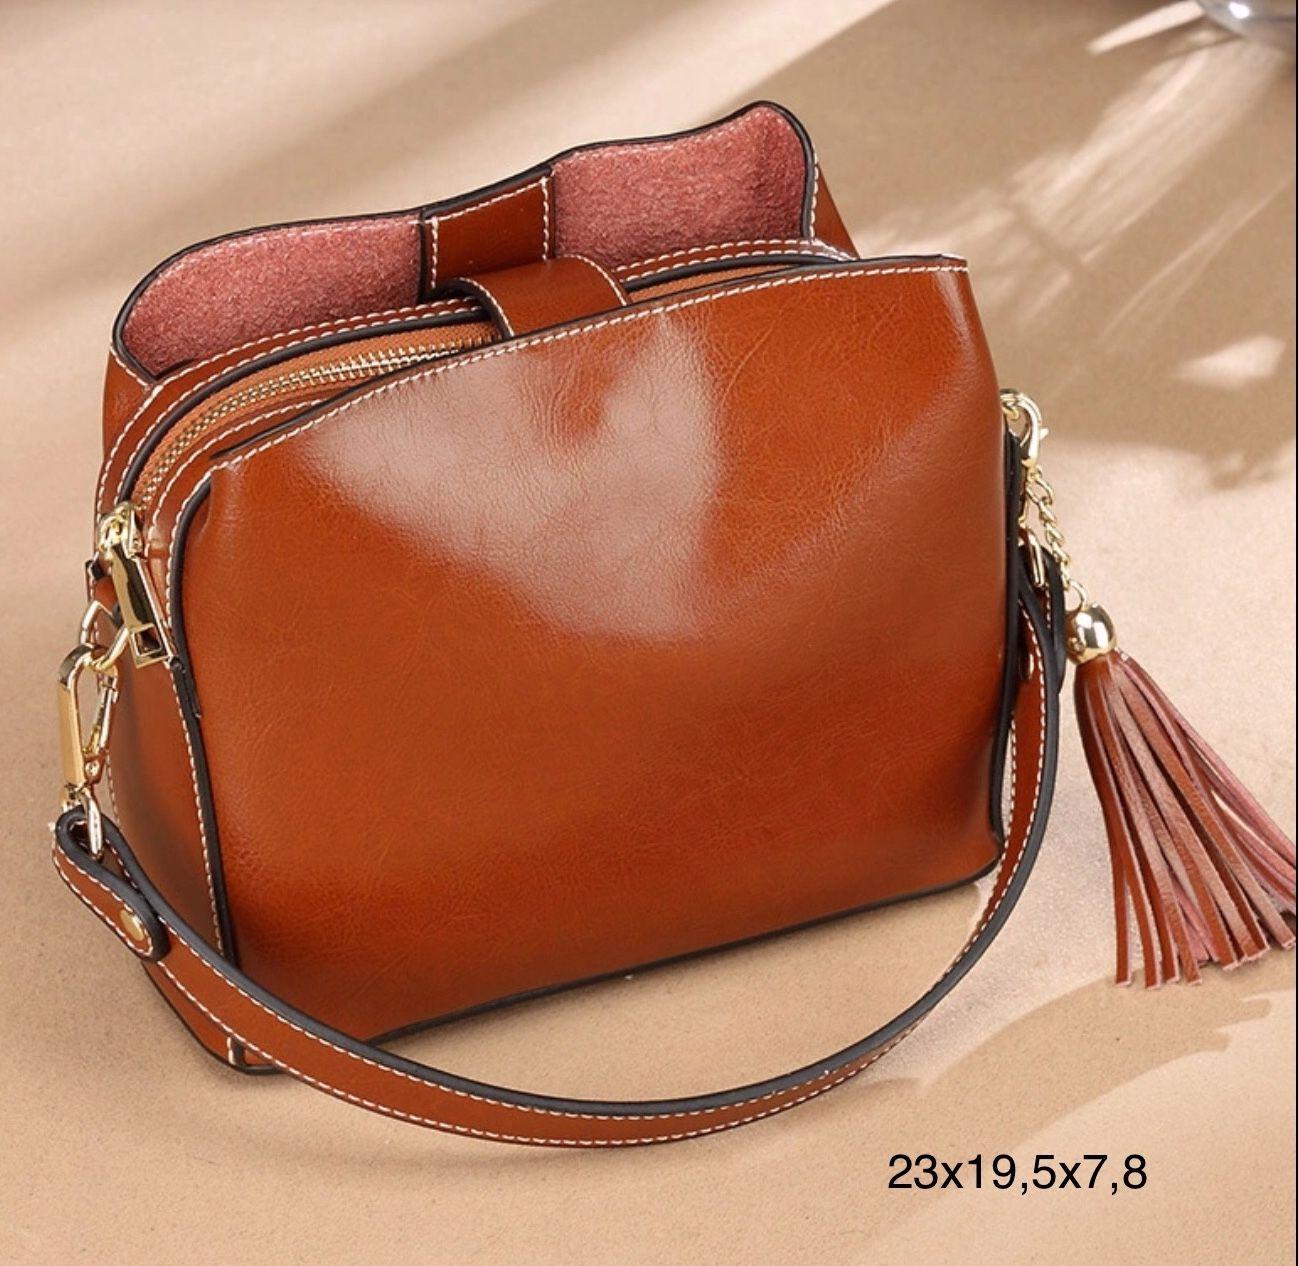 Handmade Bags, Cl, Shoulder Bag, Shoulder Bags, Crossbody Bag, Satchel Bag 2431802c13d